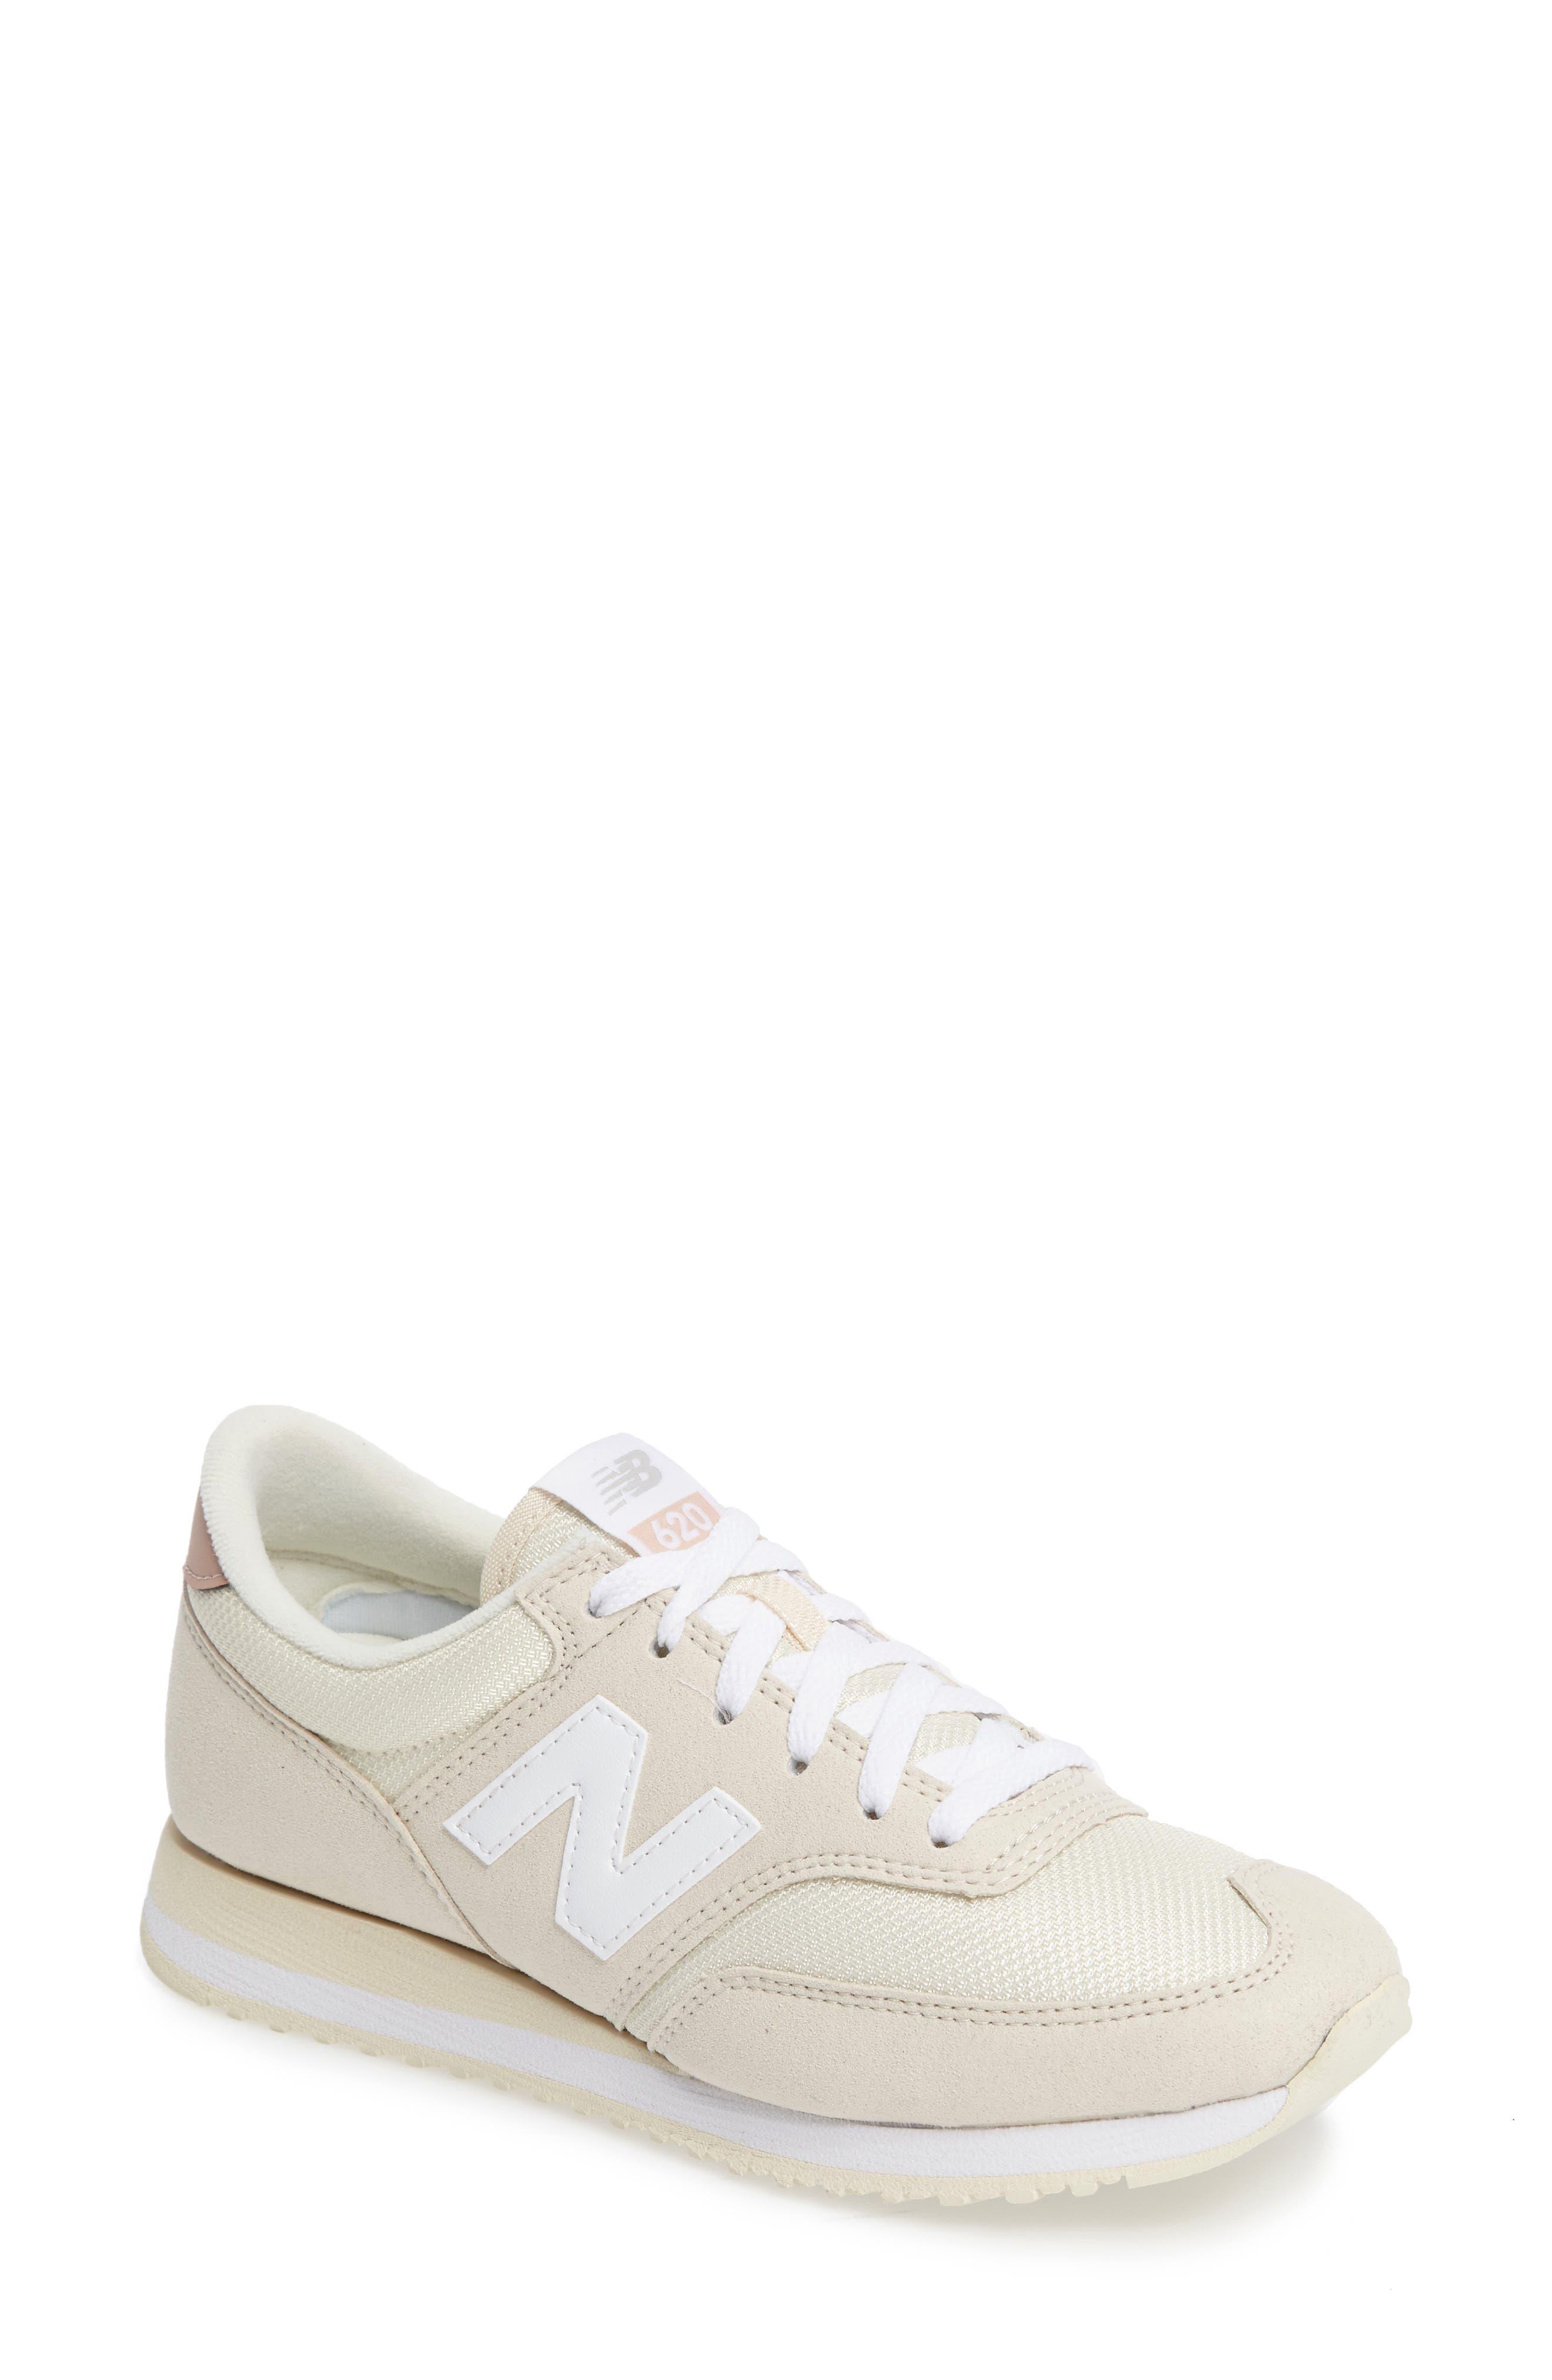 Main Image - New Balance '620' Sneaker (Women)